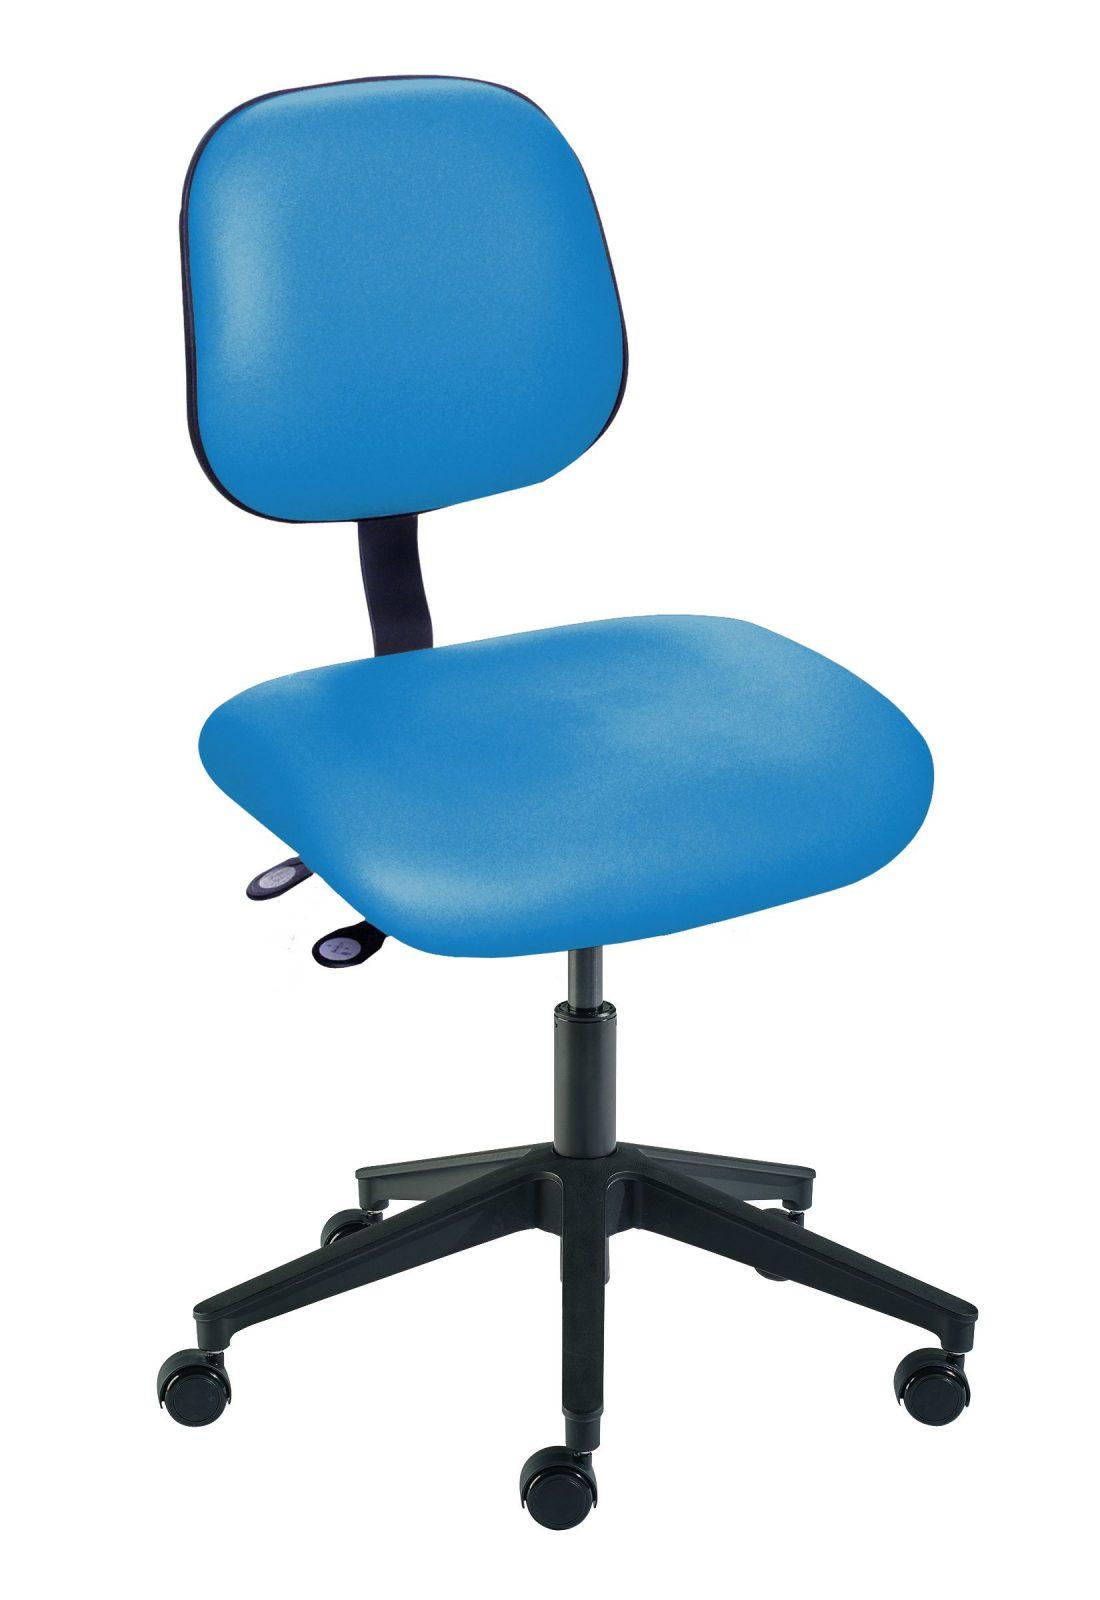 Avenue AE Chair Black Plastic